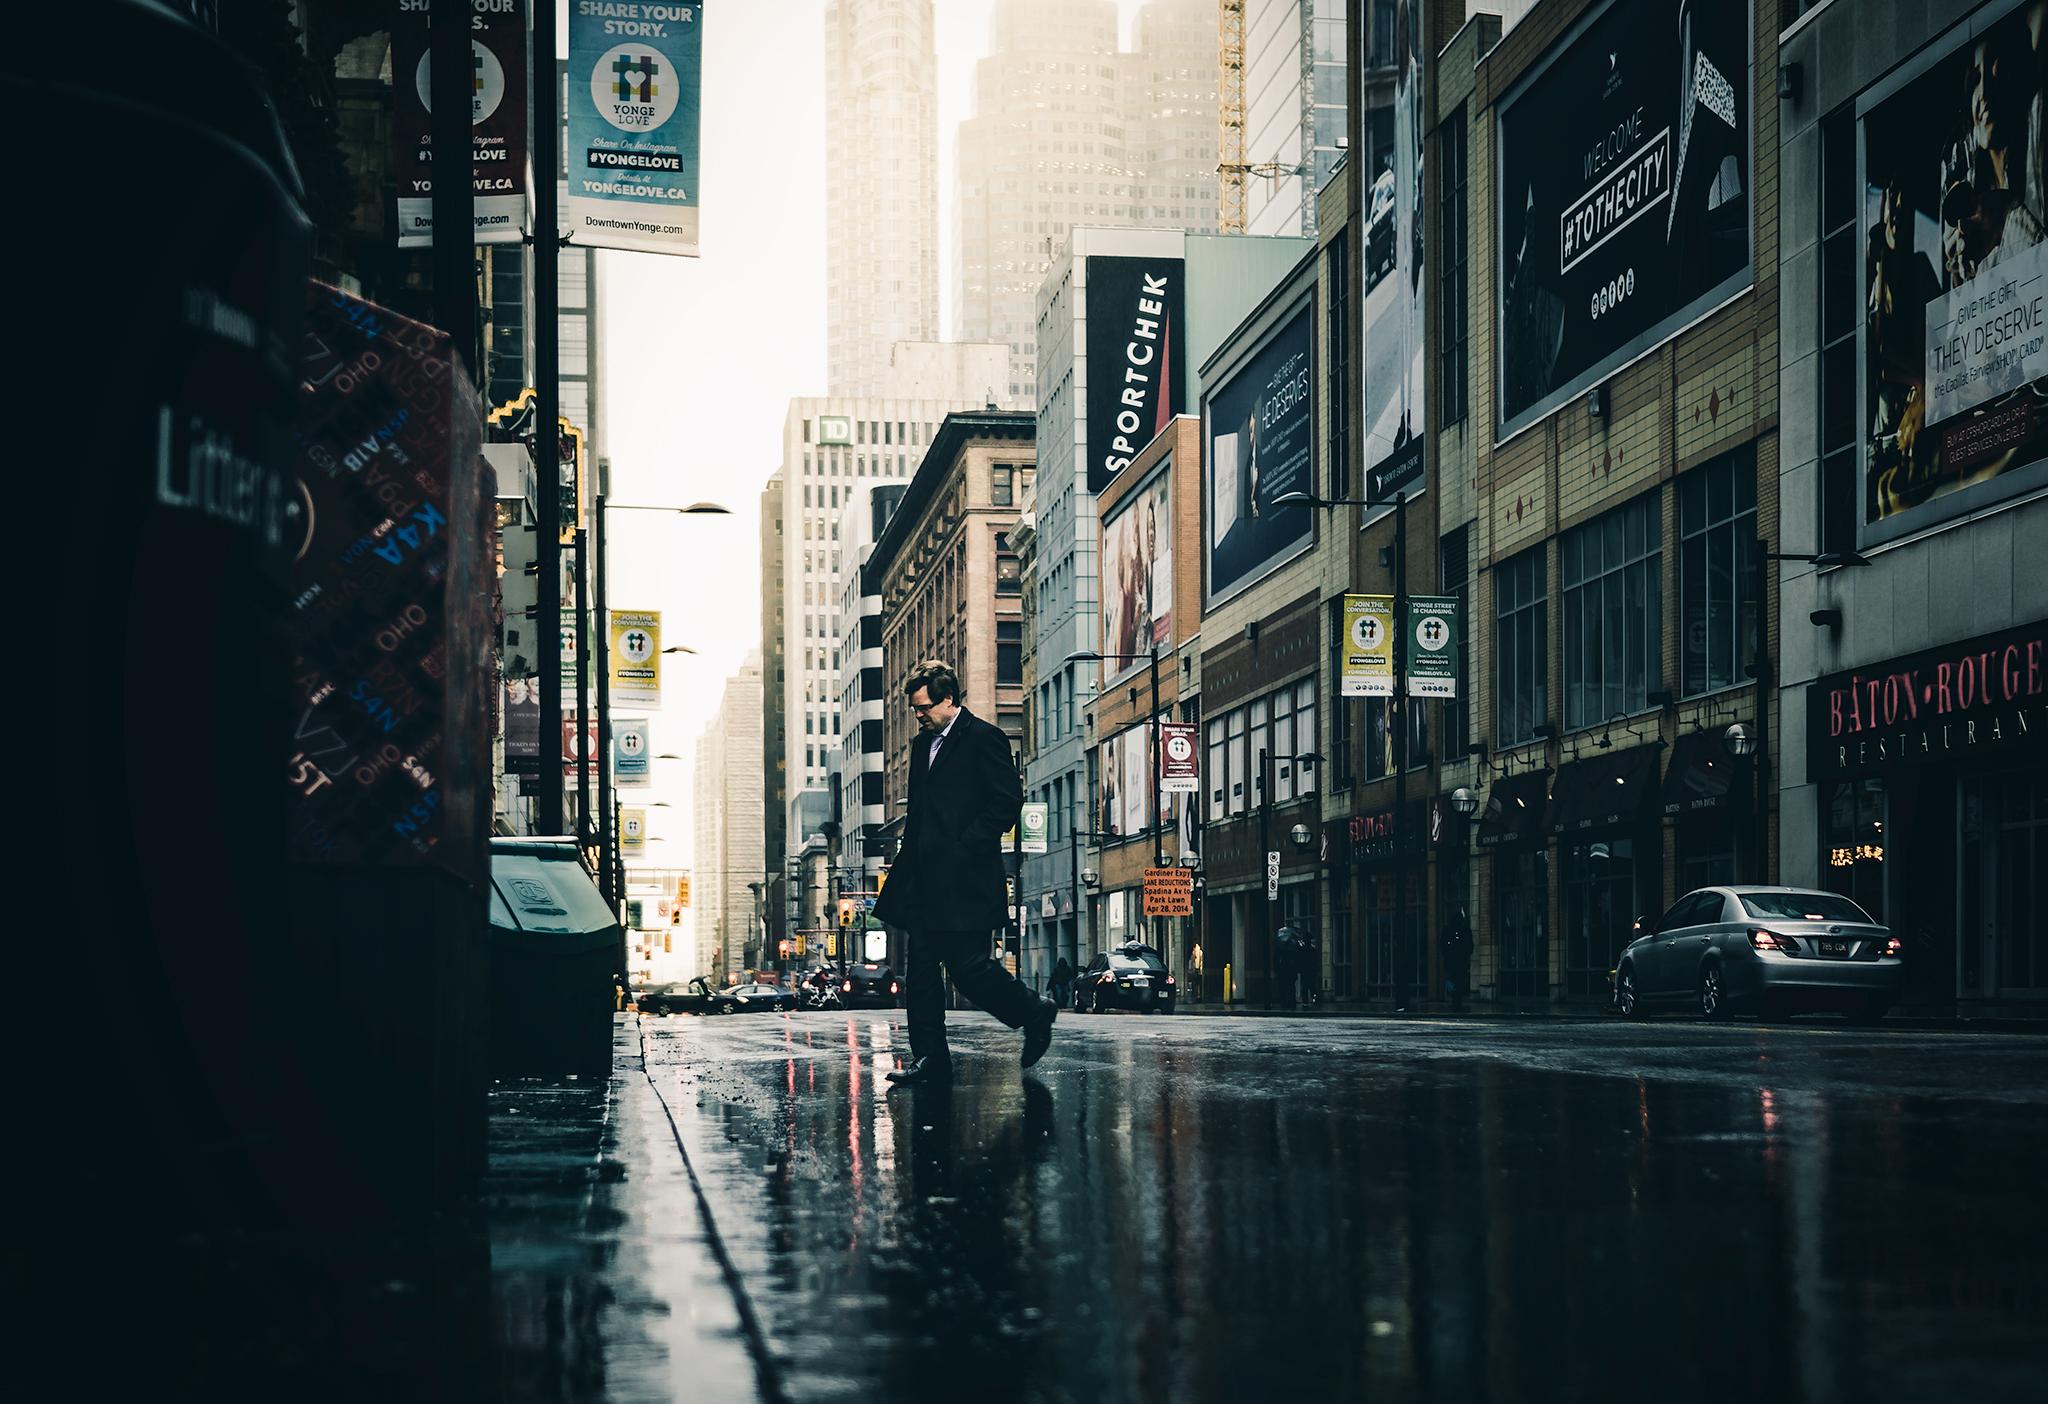 Man crossing the street during the rain. Toronto, ON, Canada.